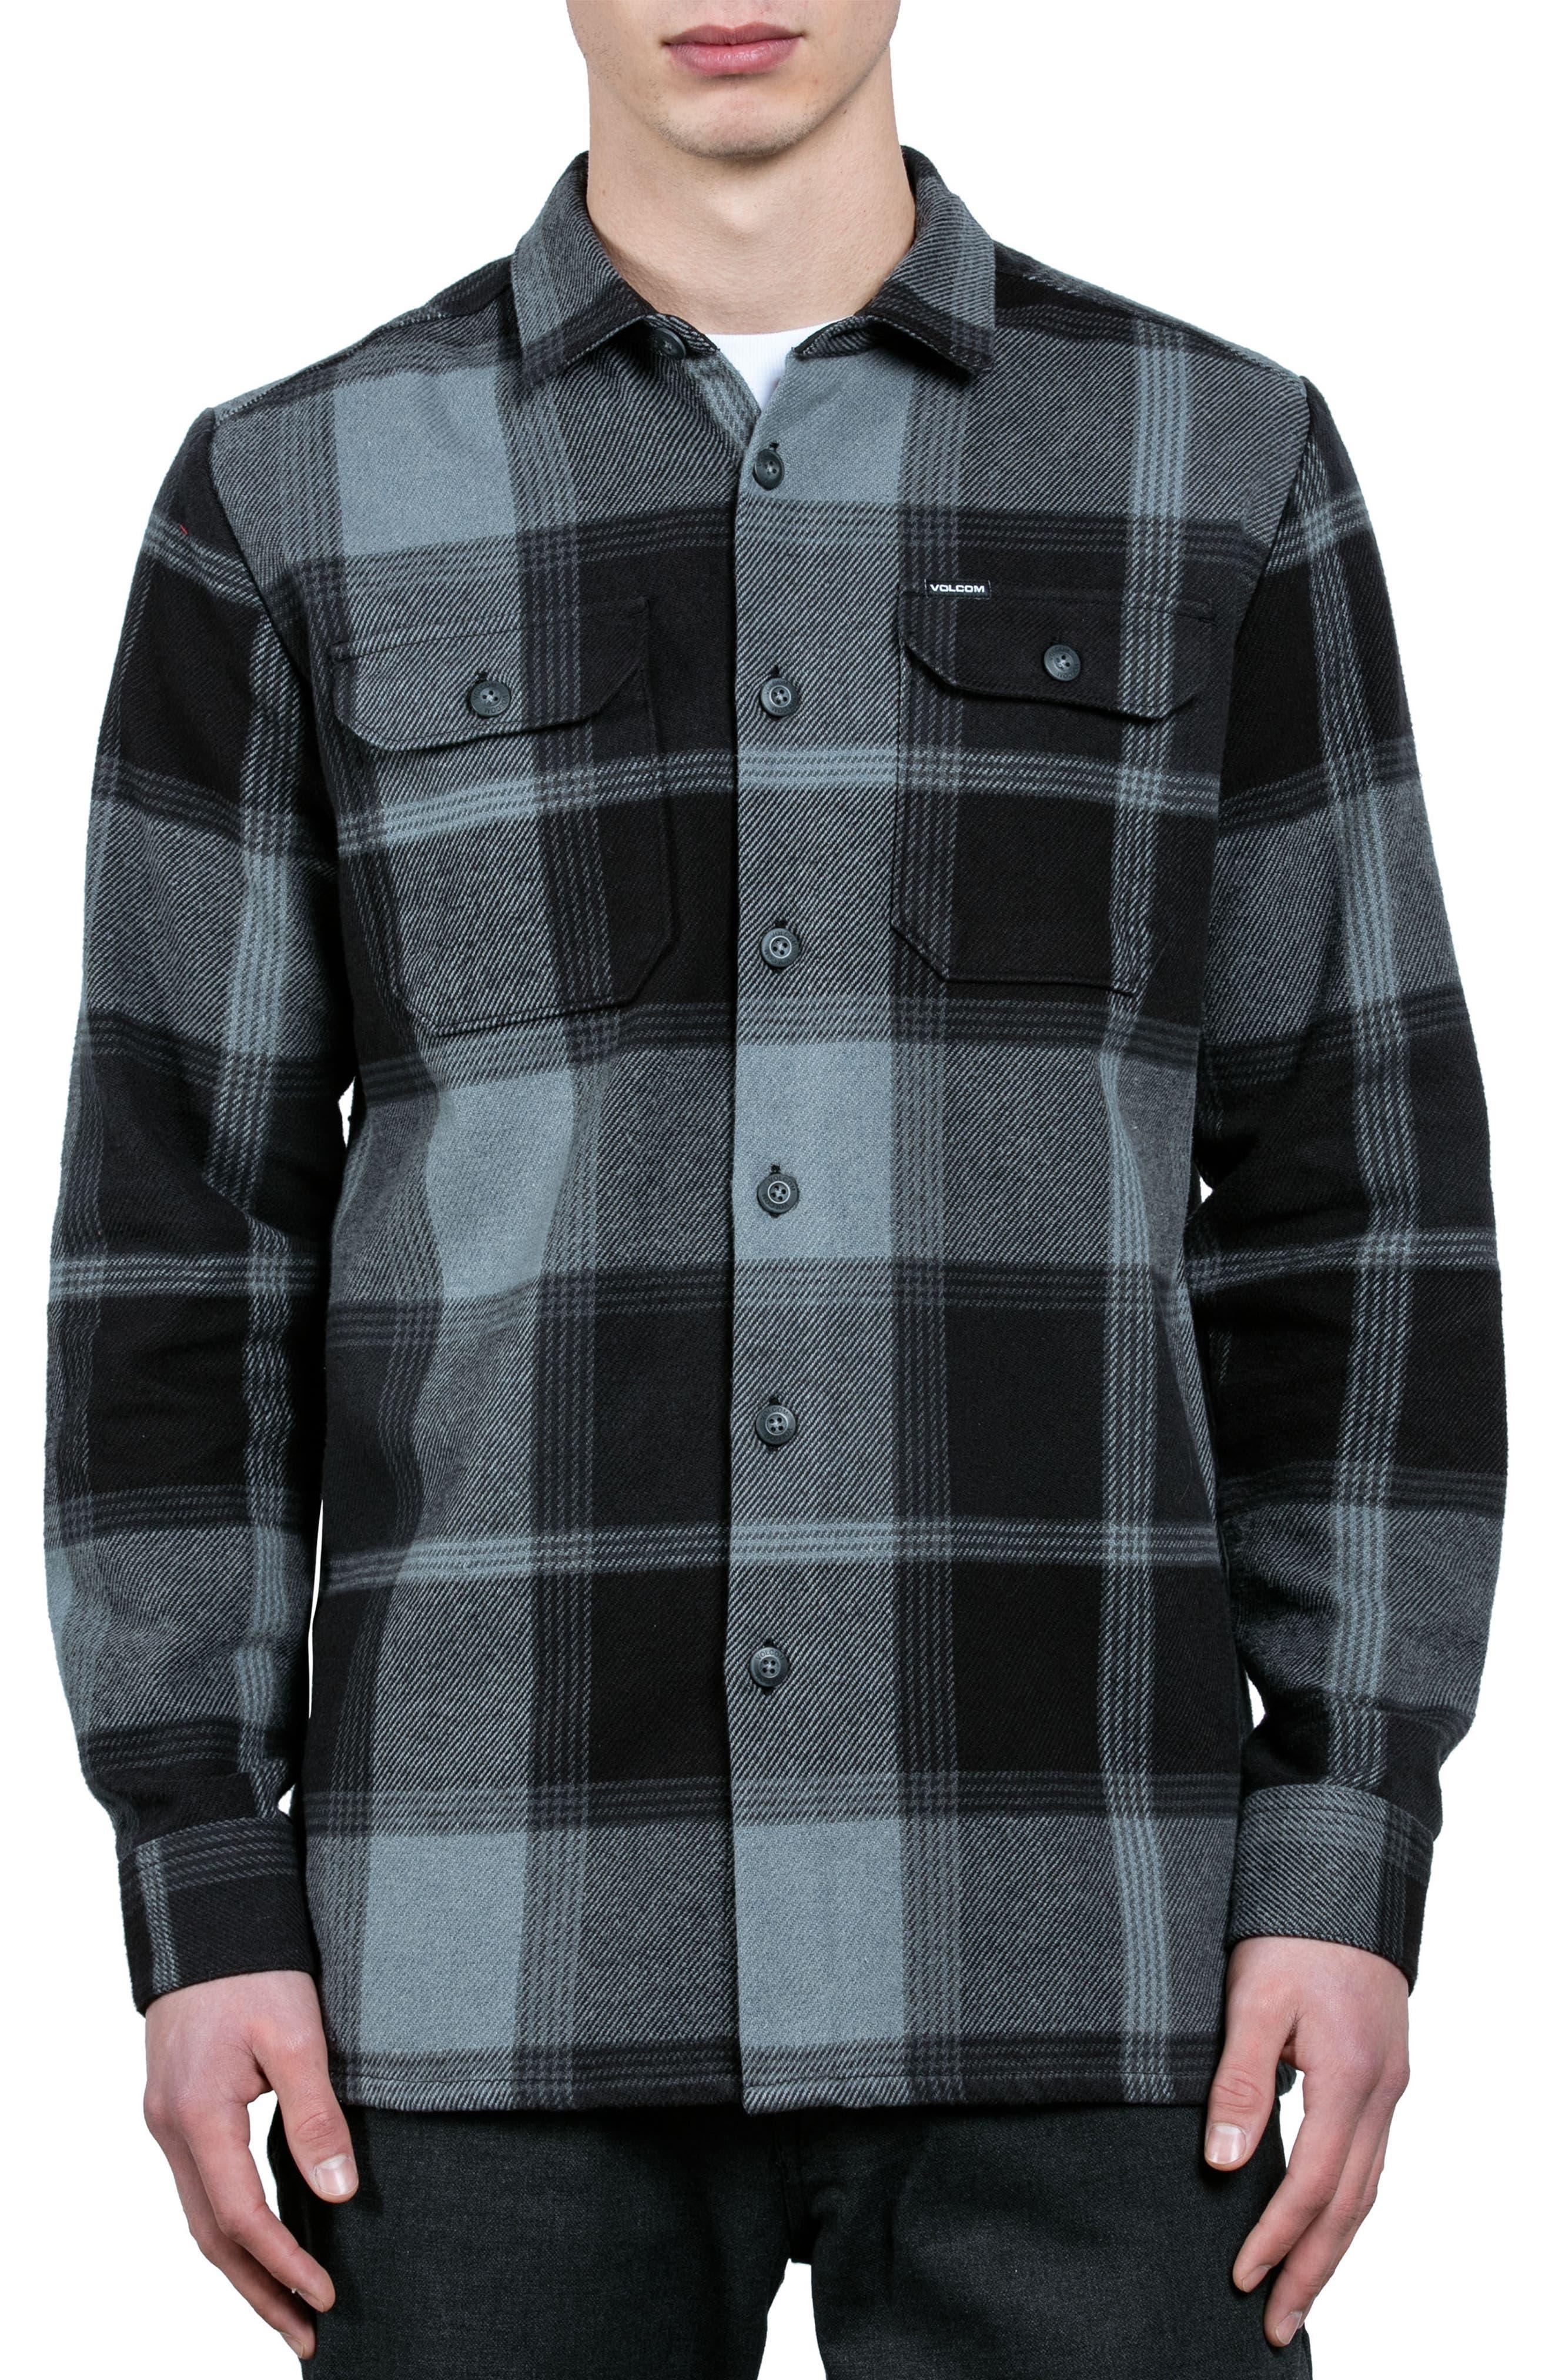 Main Image - Volcom Heavy Daze Plaid Flannel Shirt Jacket